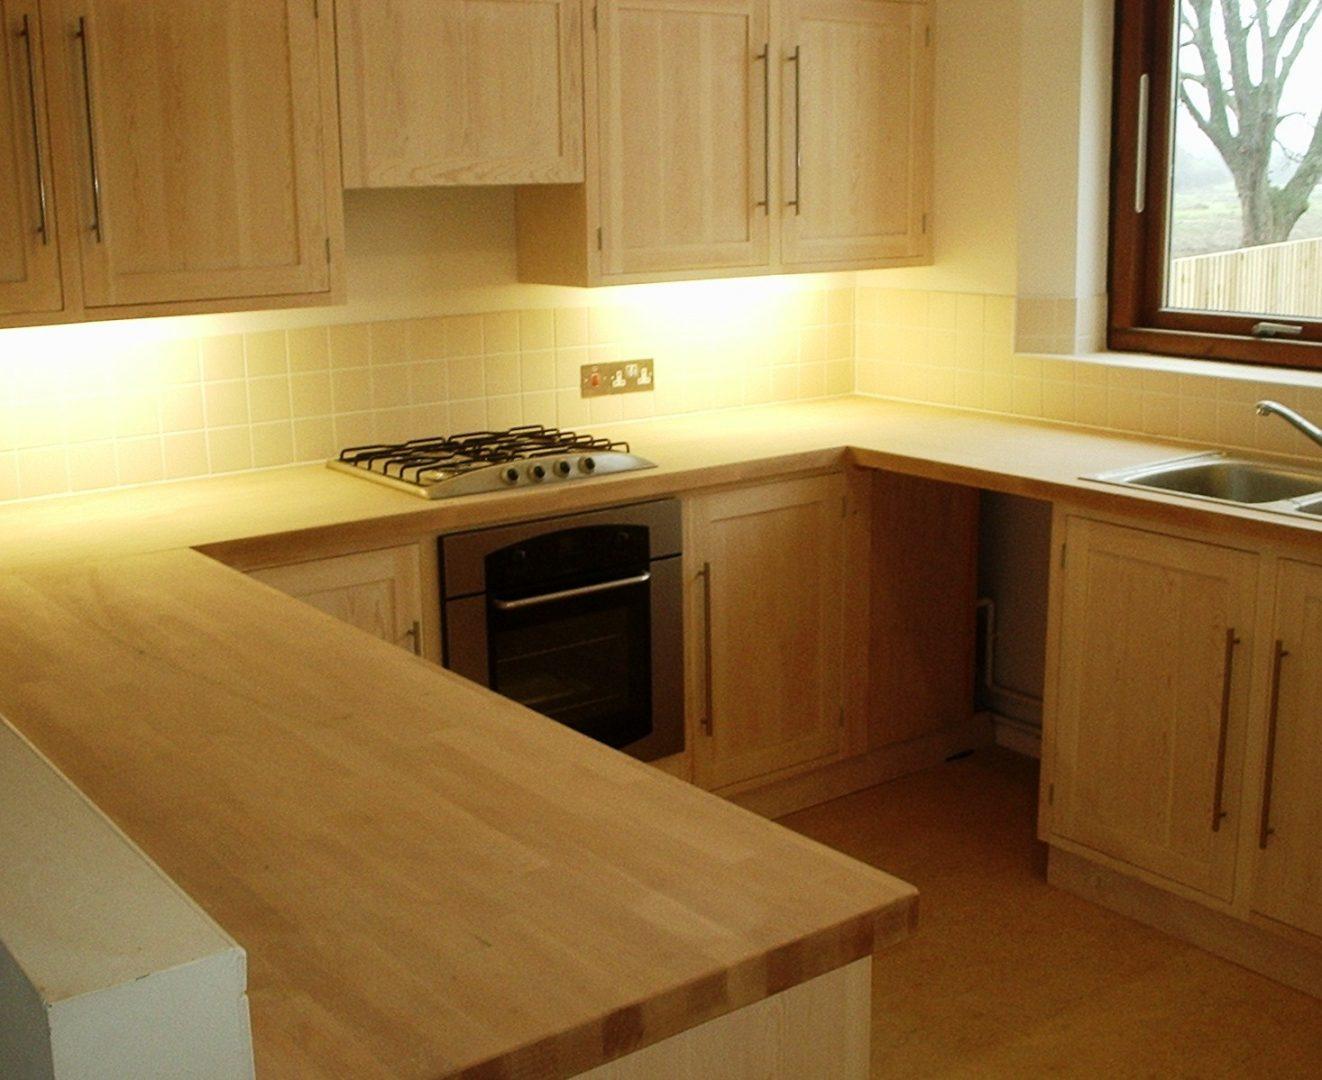 Encimera madera cocina cocina pequea blanca madera - Encimera madera cocina ...